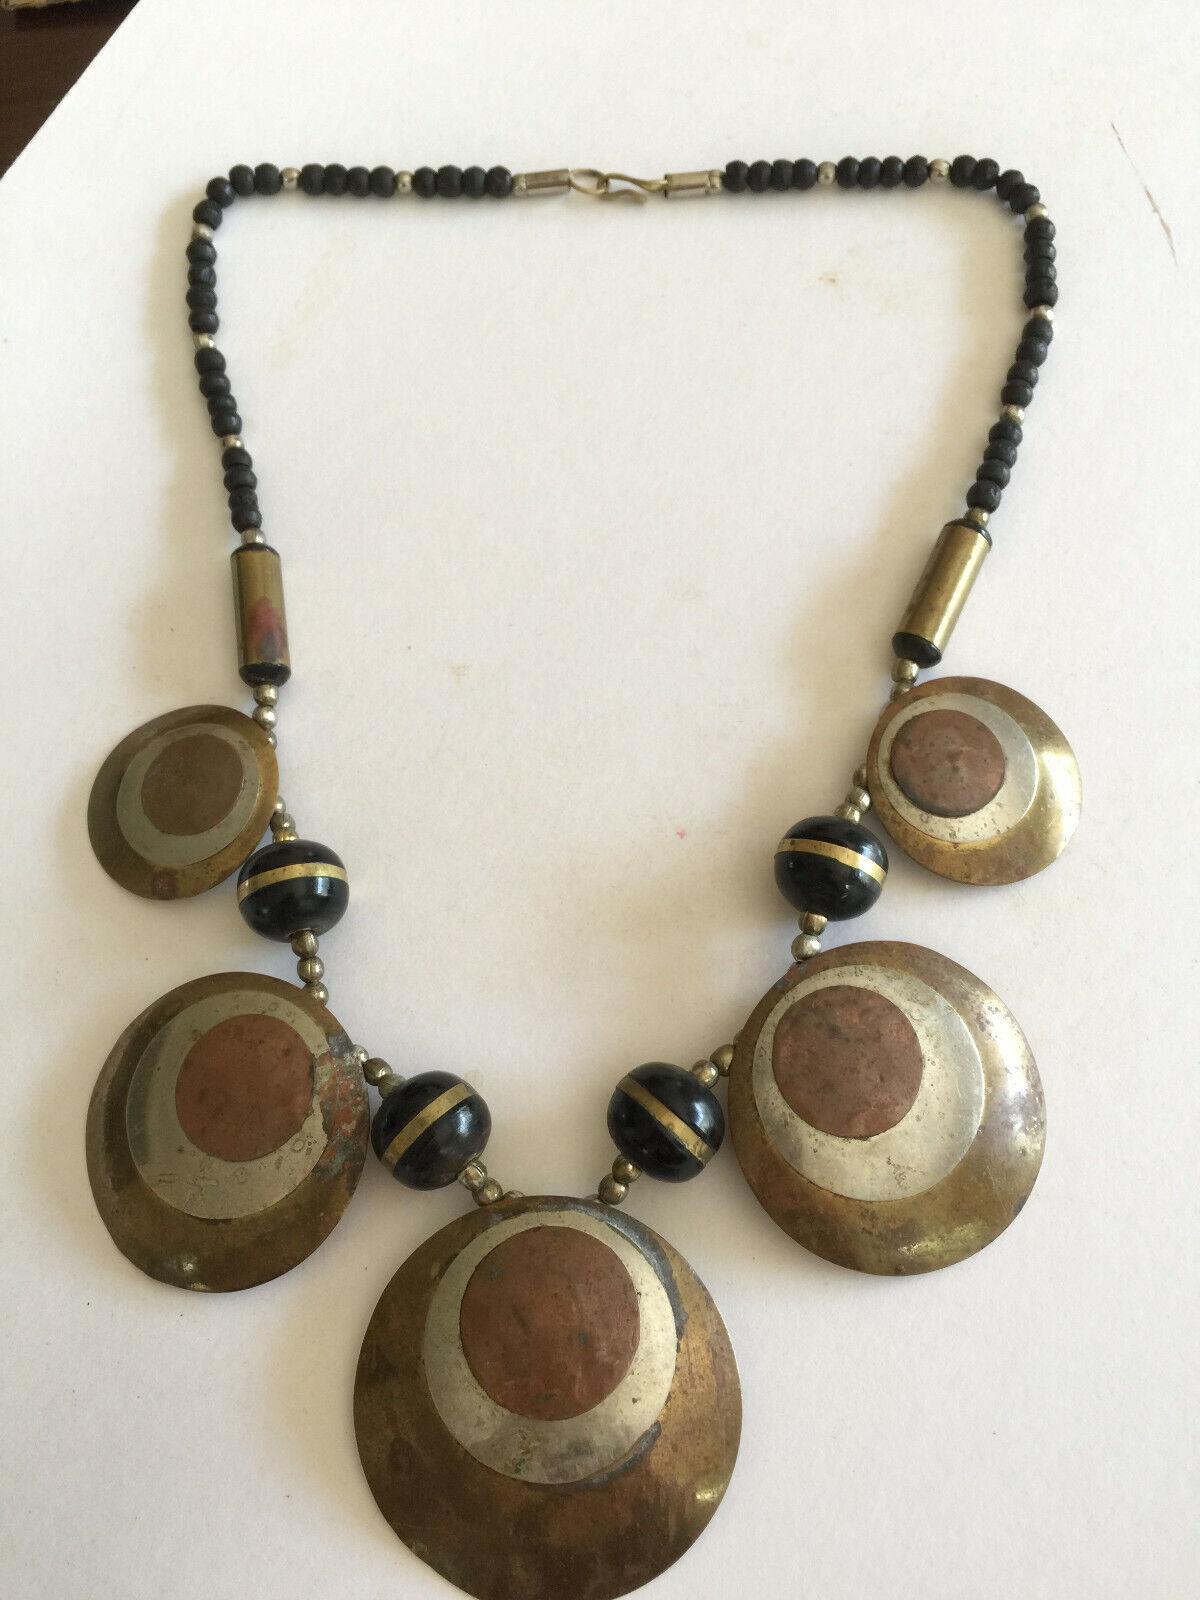 Vintage metal / Copper pieces statement Necklace w/ 52 (48+4) ebony wooden beads